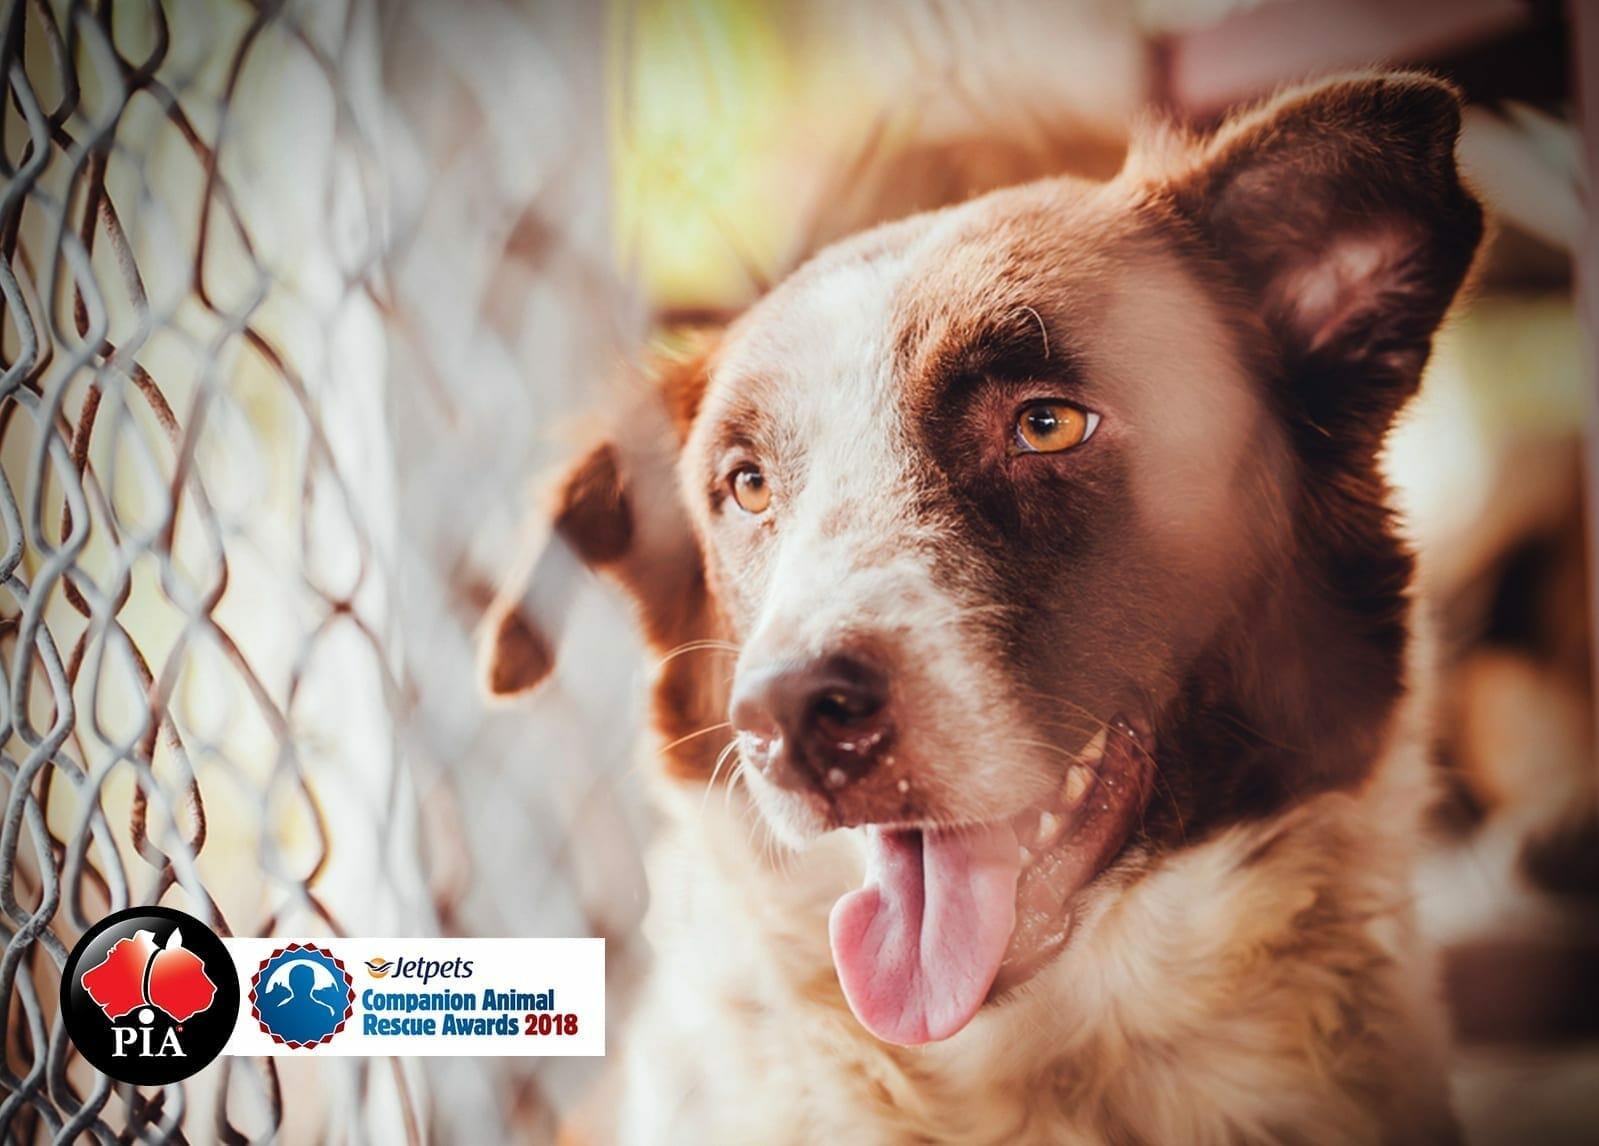 Jetpets Companion Animal Rescue Awards 2018